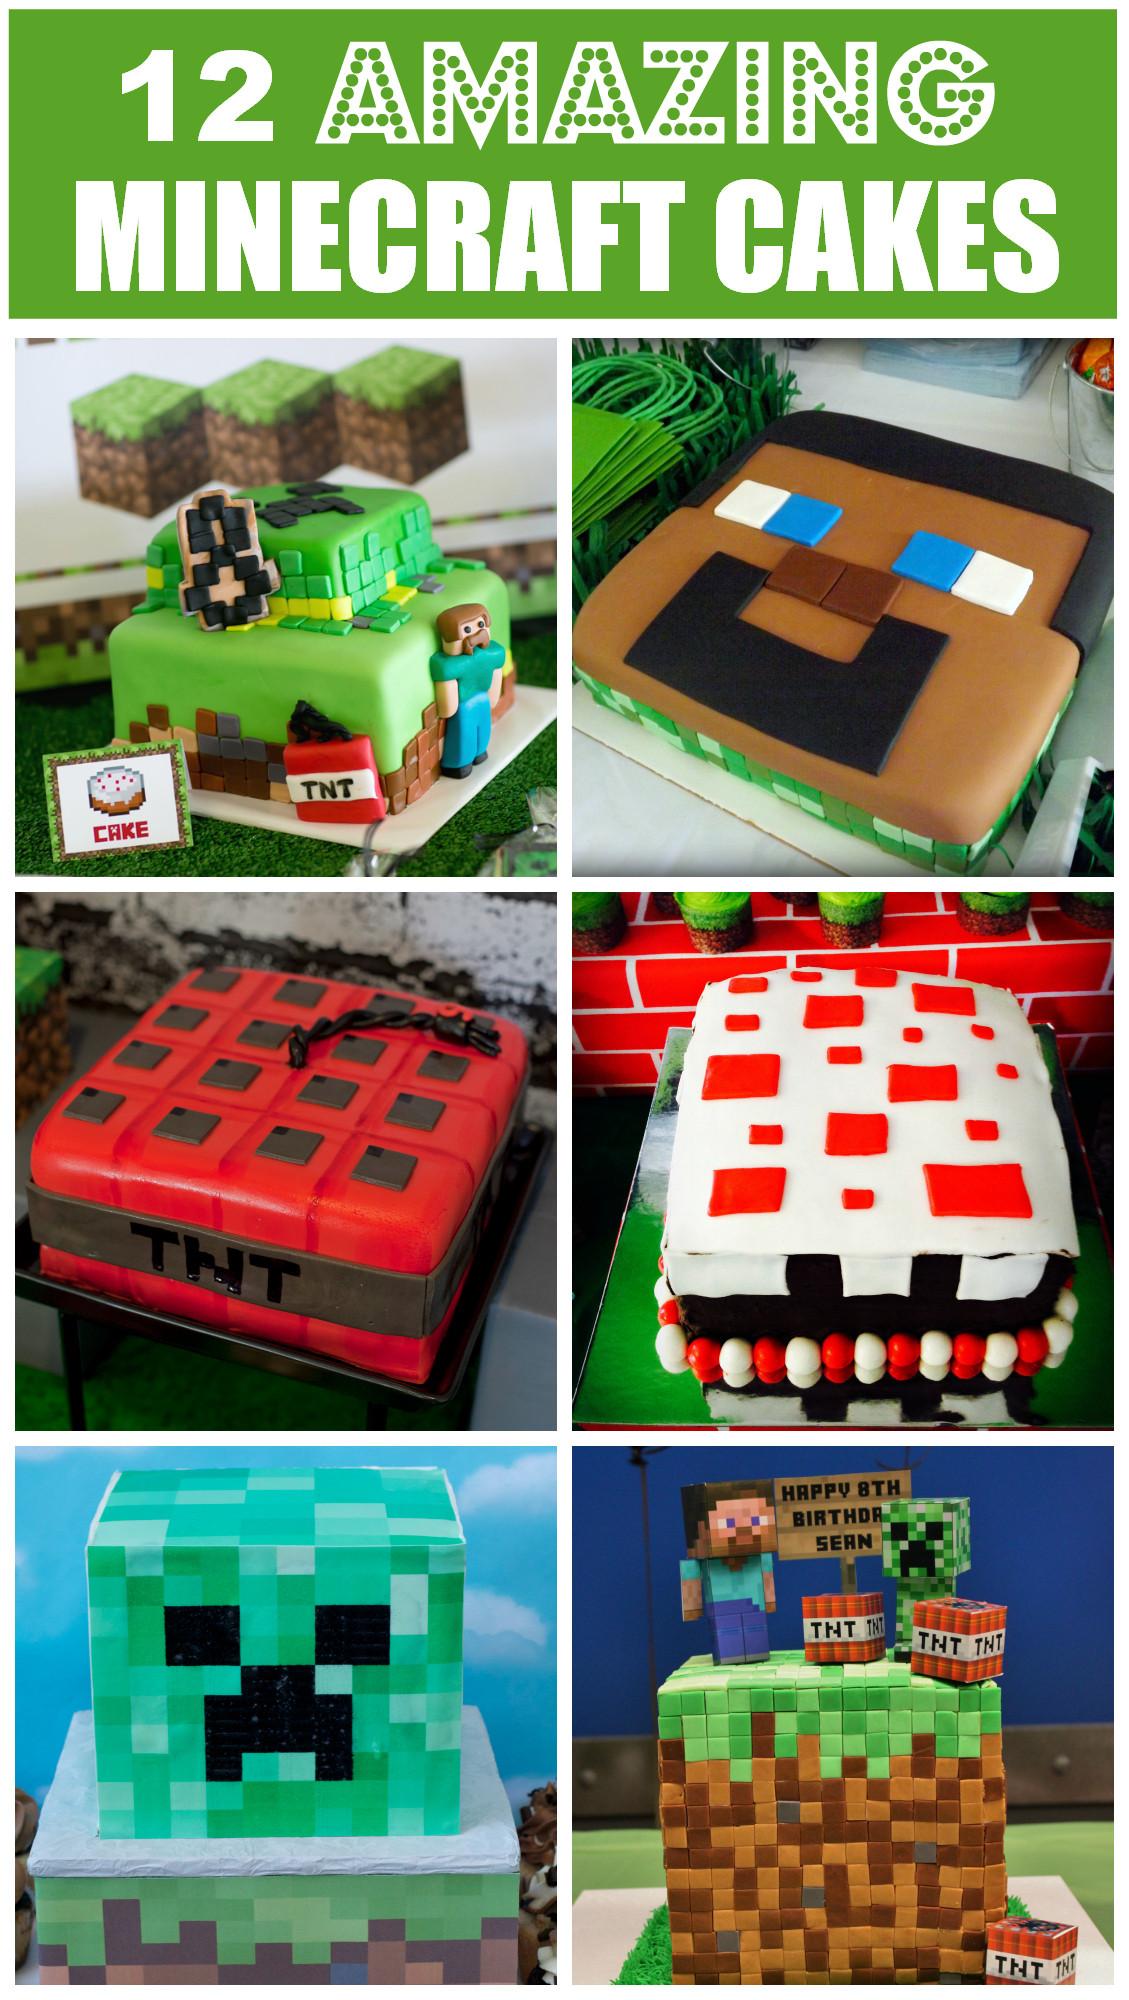 How To Make A Minecraft Birthday Cake  12 Amazing Minecraft Birthday Cakes